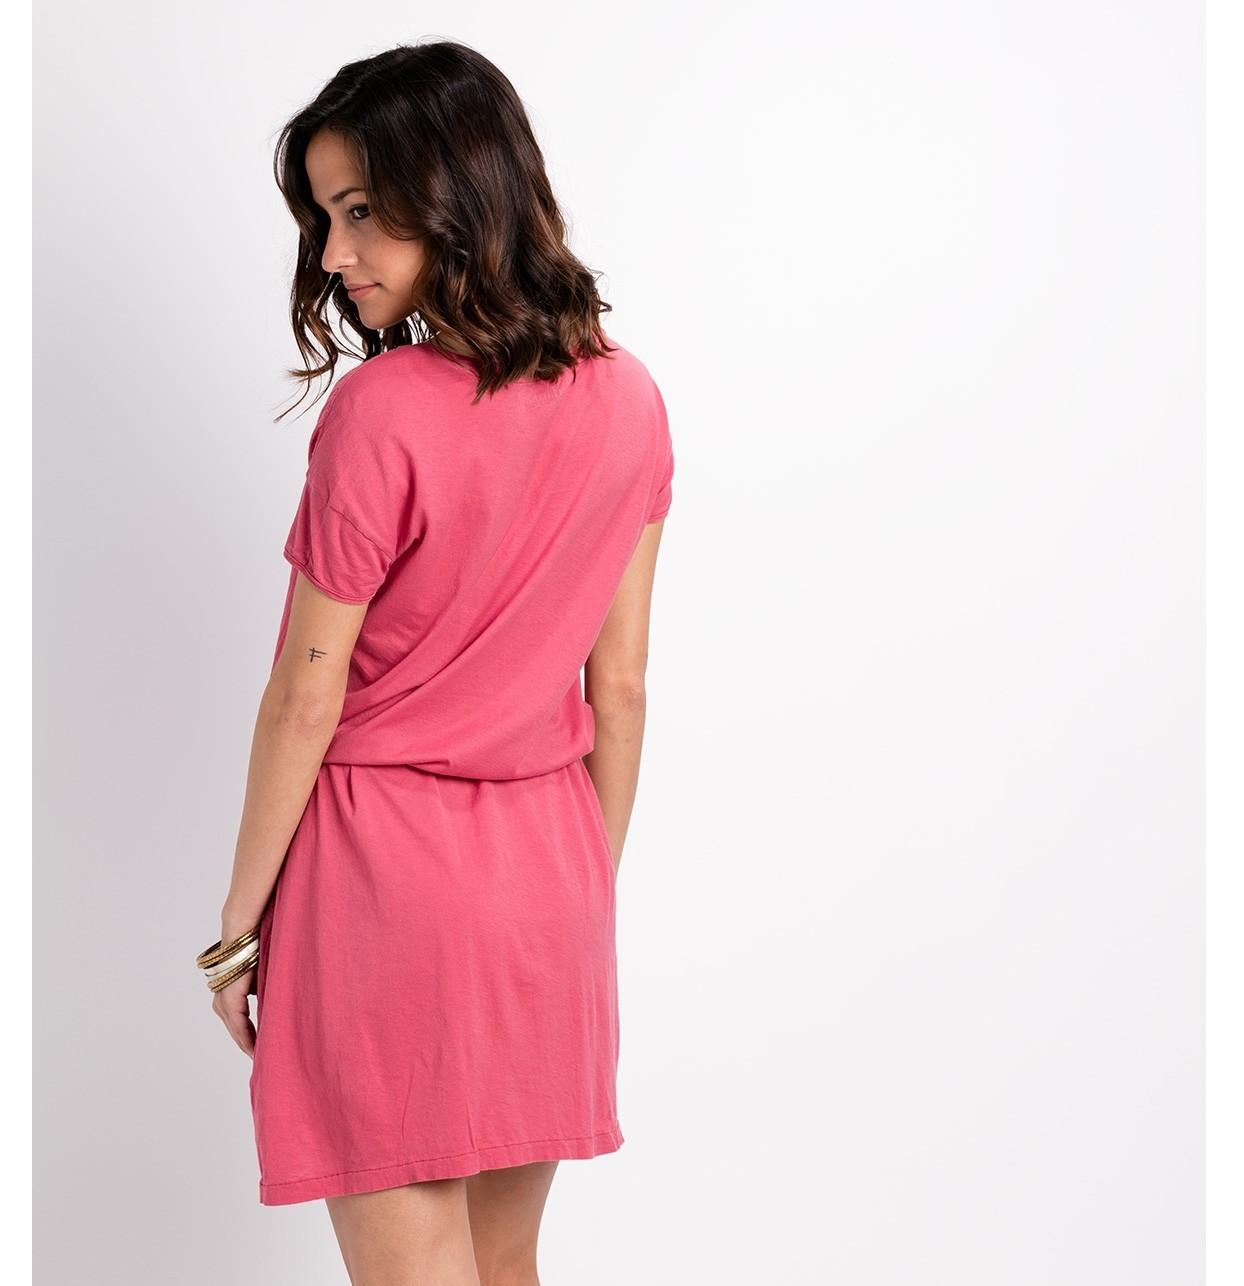 Vestido fluido manga corta modelo DRESS color rosa, 100% Algodón. - Ítem1